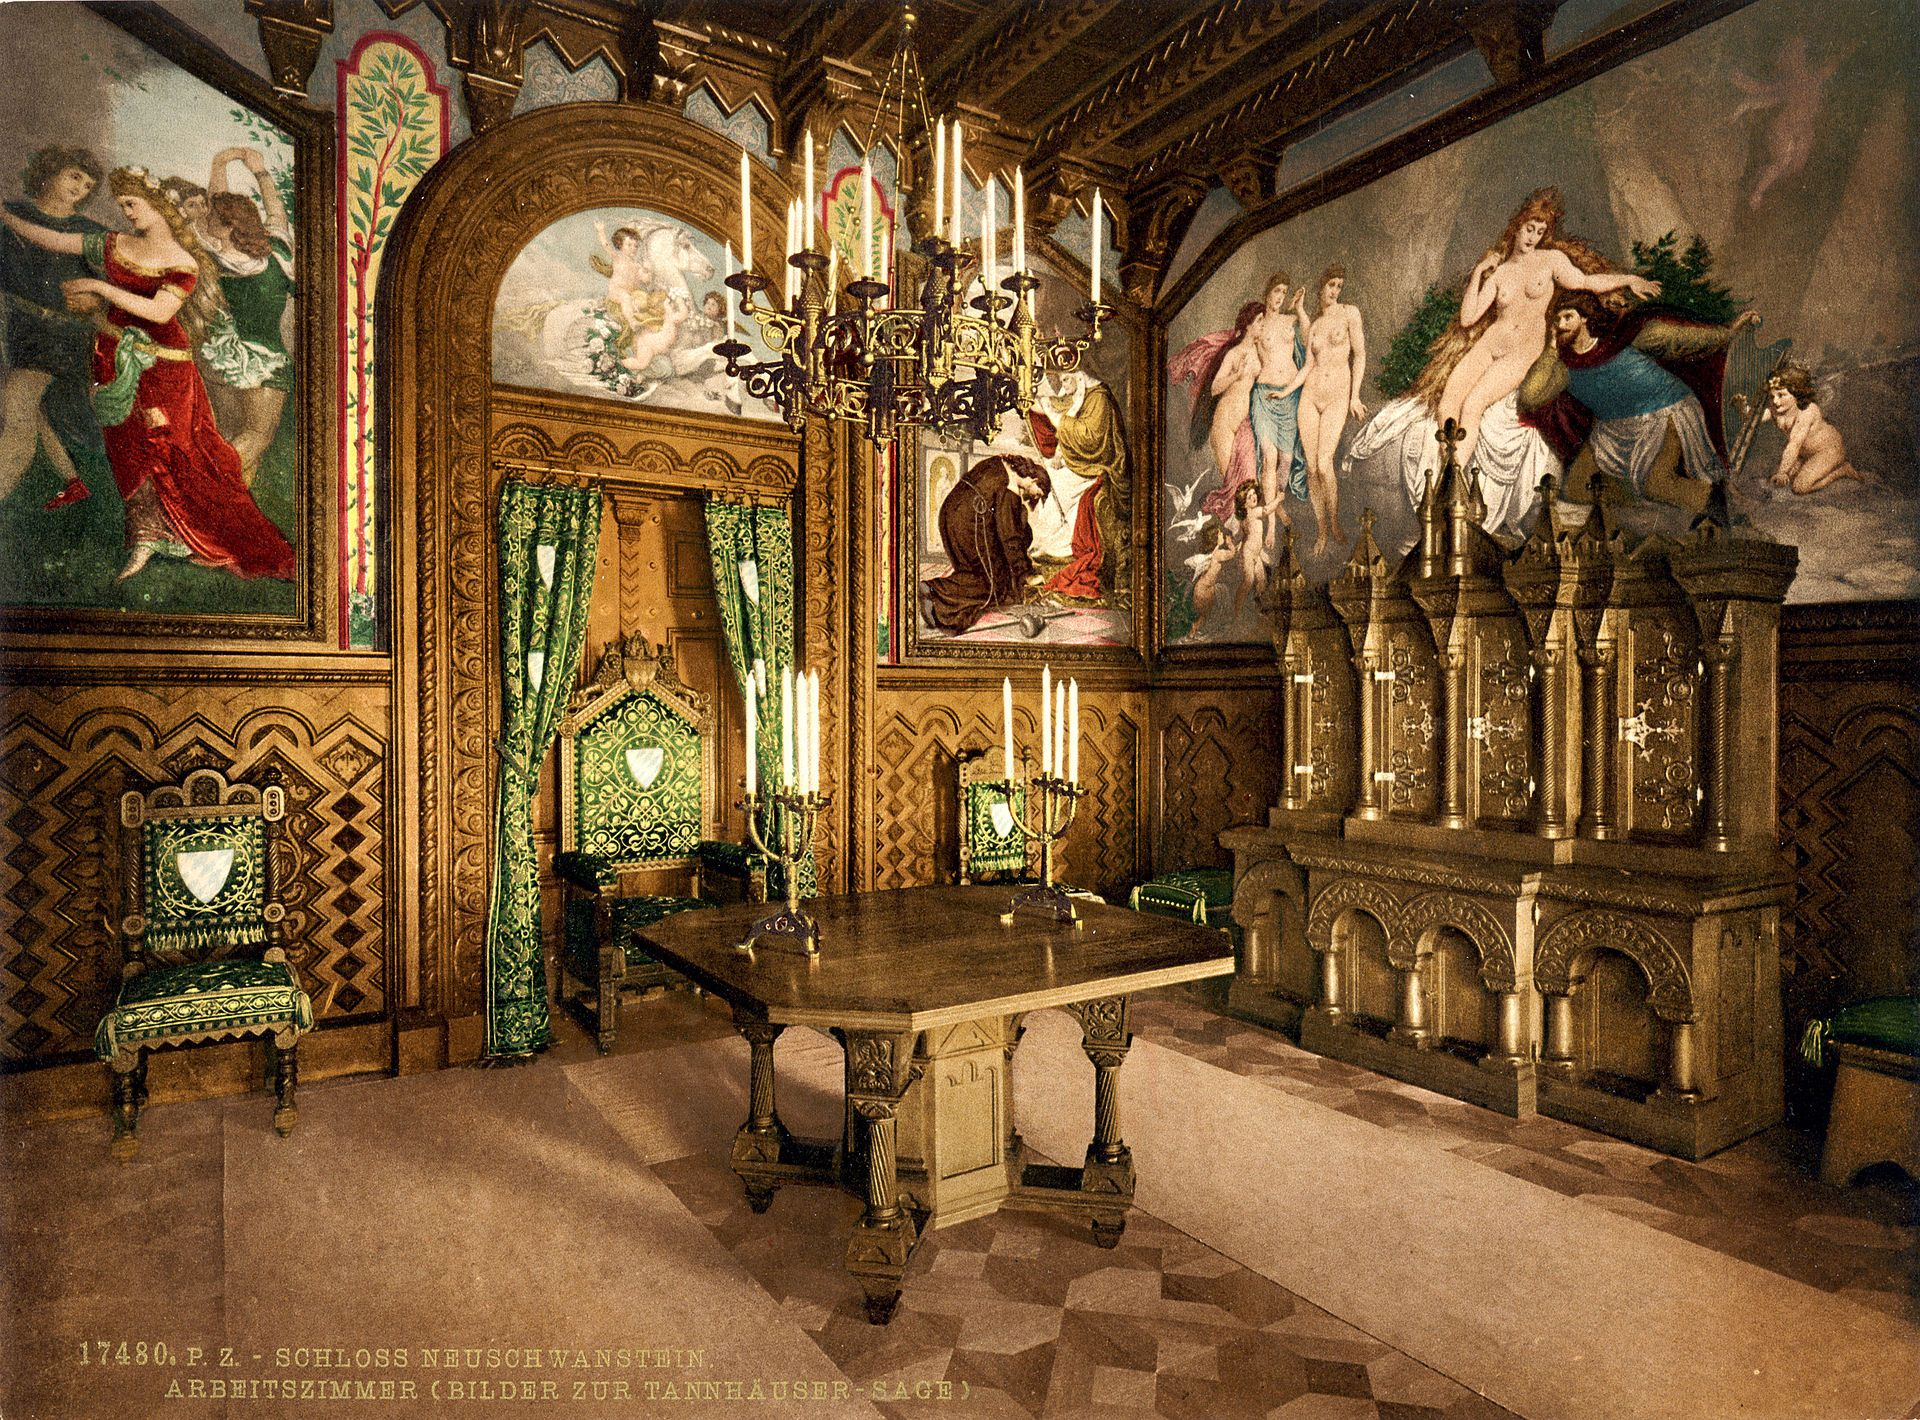 Neuschwanstein Castle Wikipedia Neuschwanstein Castle Germany Castles Castle Rooms